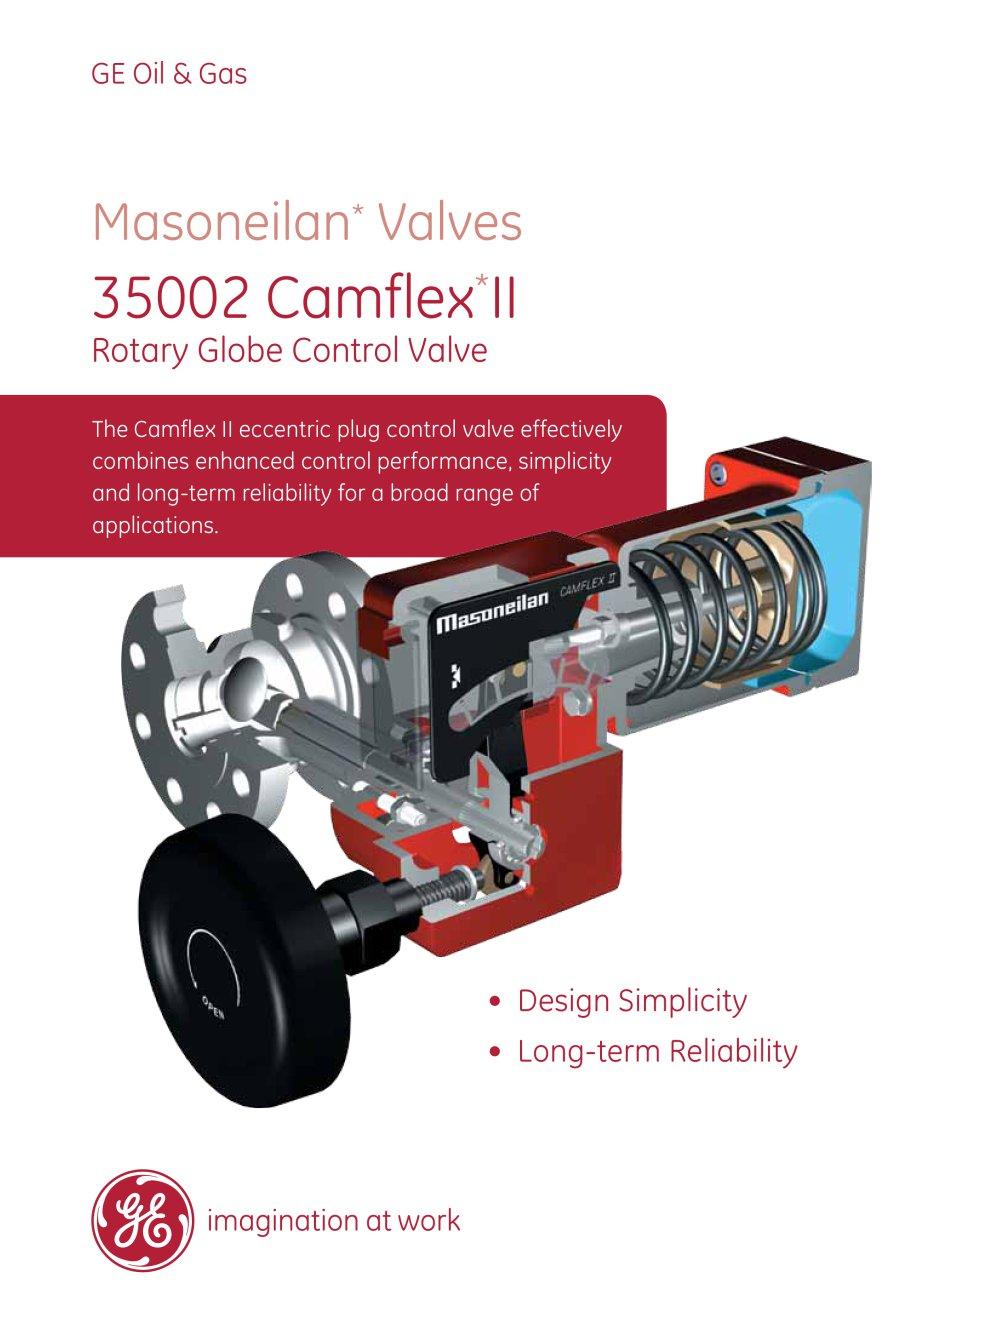 Masoneilan 35002 series camflex rotary control valve ge gas masoneilan 35002 series camflex rotary control valve 1 12 pages publicscrutiny Gallery